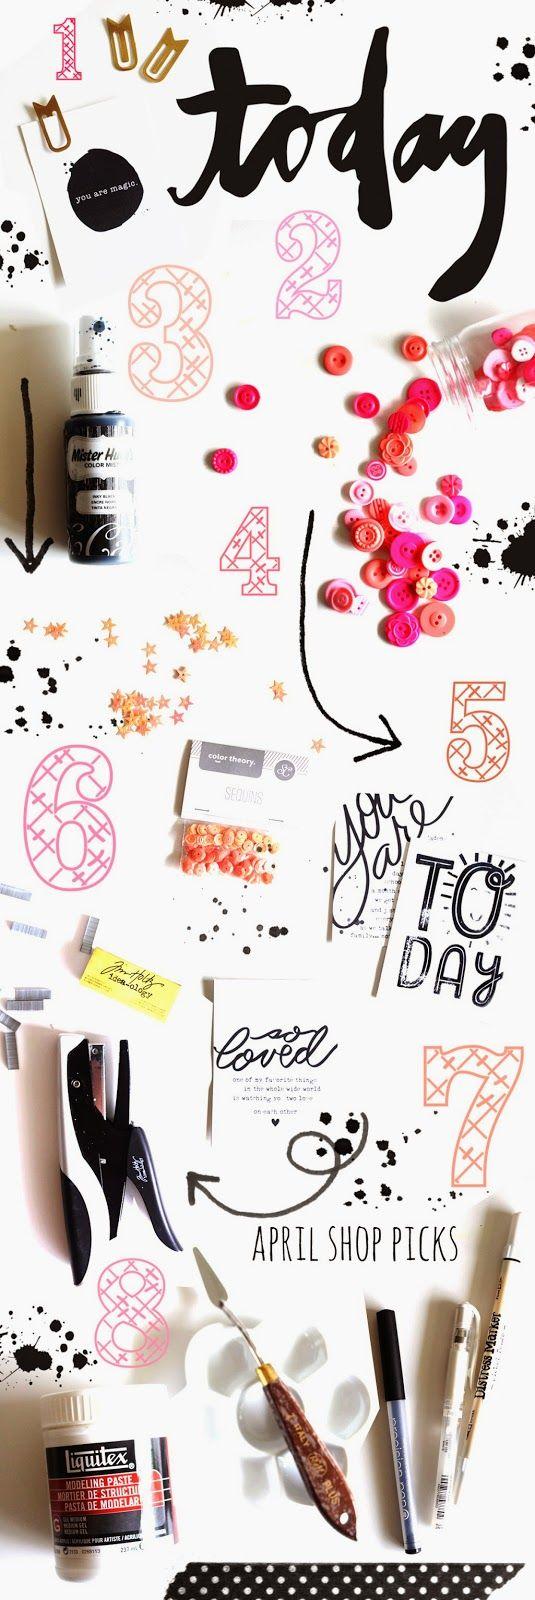 April Shop Picks for Studio Calico by Shanna Noel :)